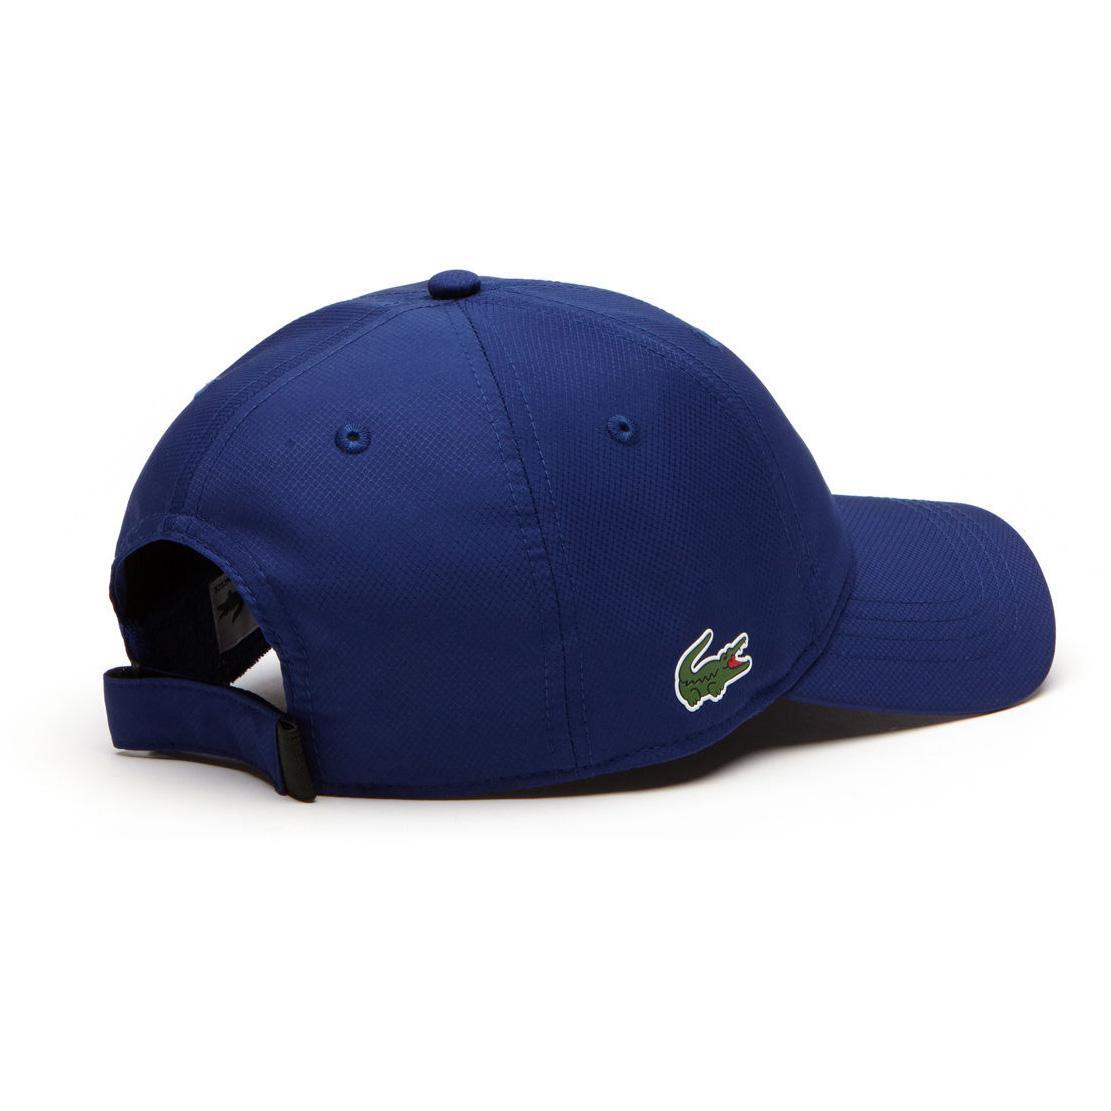 7d78dd3823d Lacoste Sport Mens Cap in Solid Diamond Weave Taffeta - Ocean Blue -  Tennisnuts.com